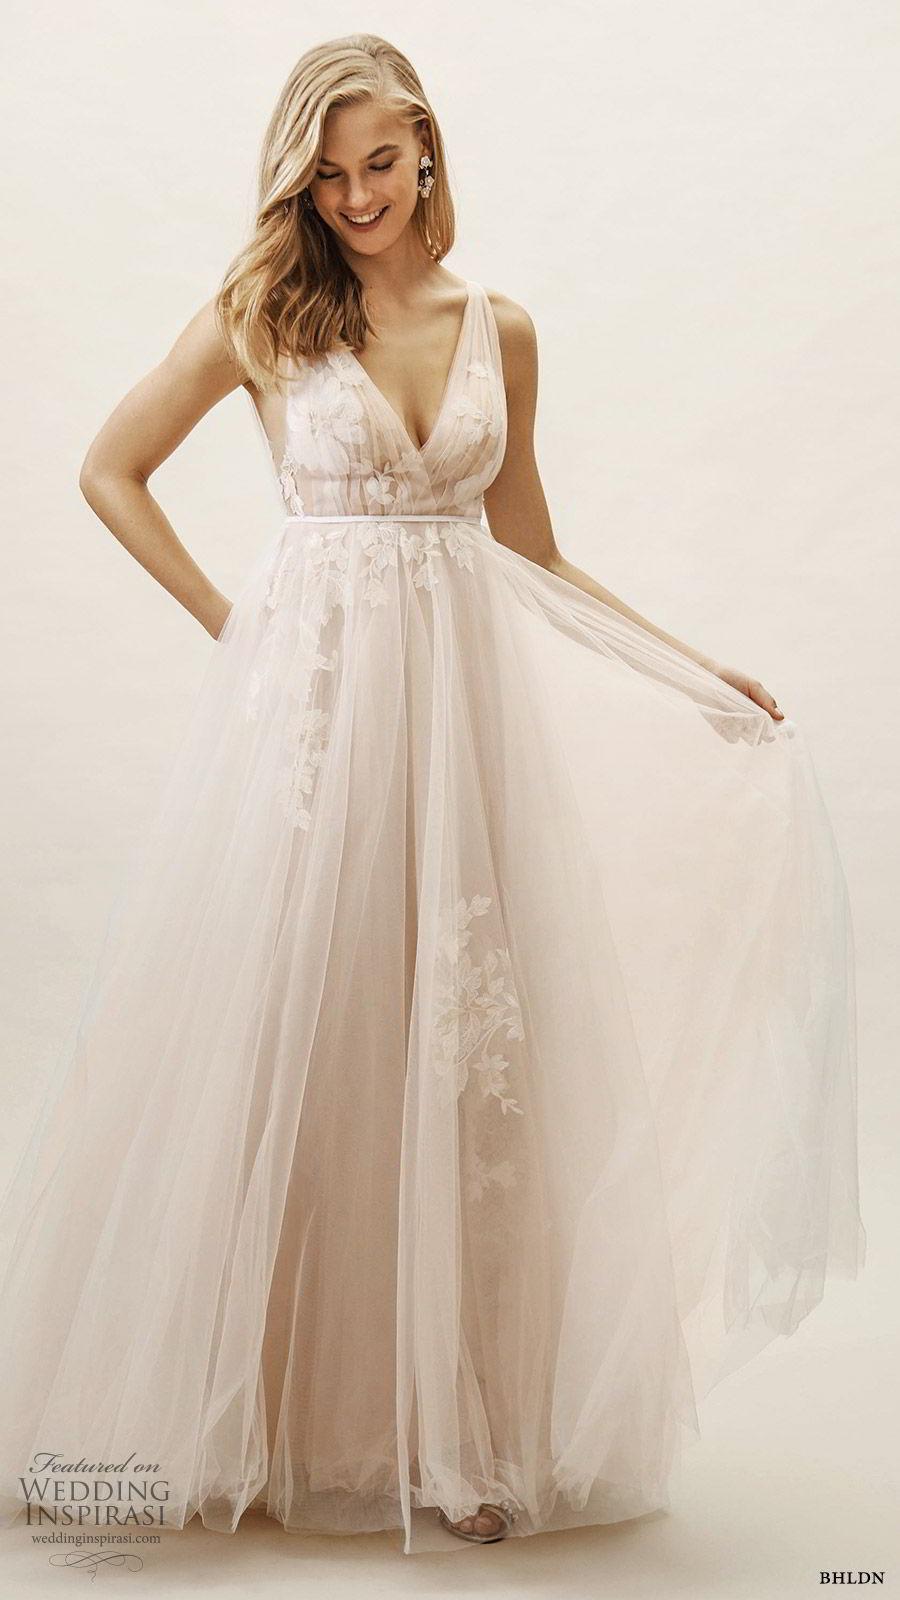 bhldn spring 2019 bridal sleeveless v neckline ruched bodice a line ball gown lace embellished wedding dress blush color (13) mv